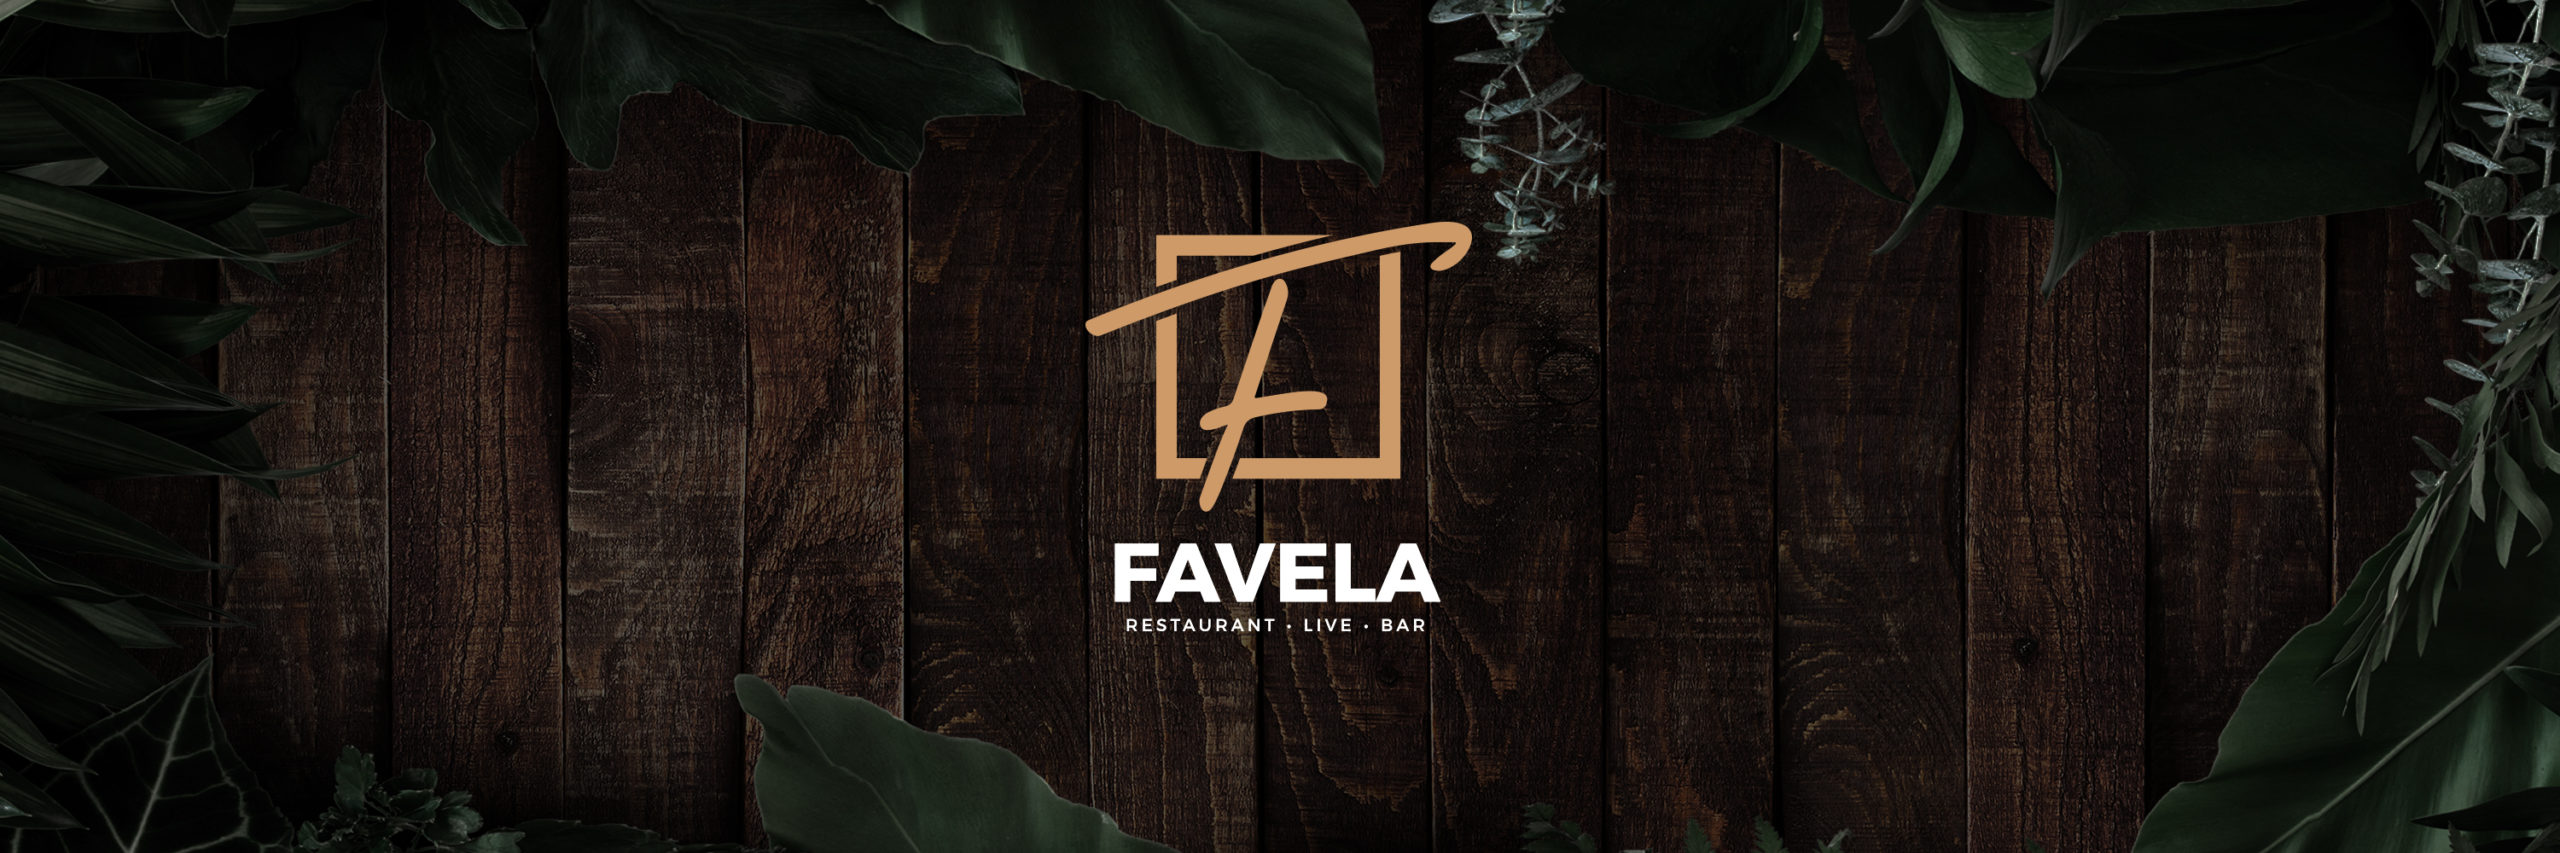 Feed-Favela_ONE7